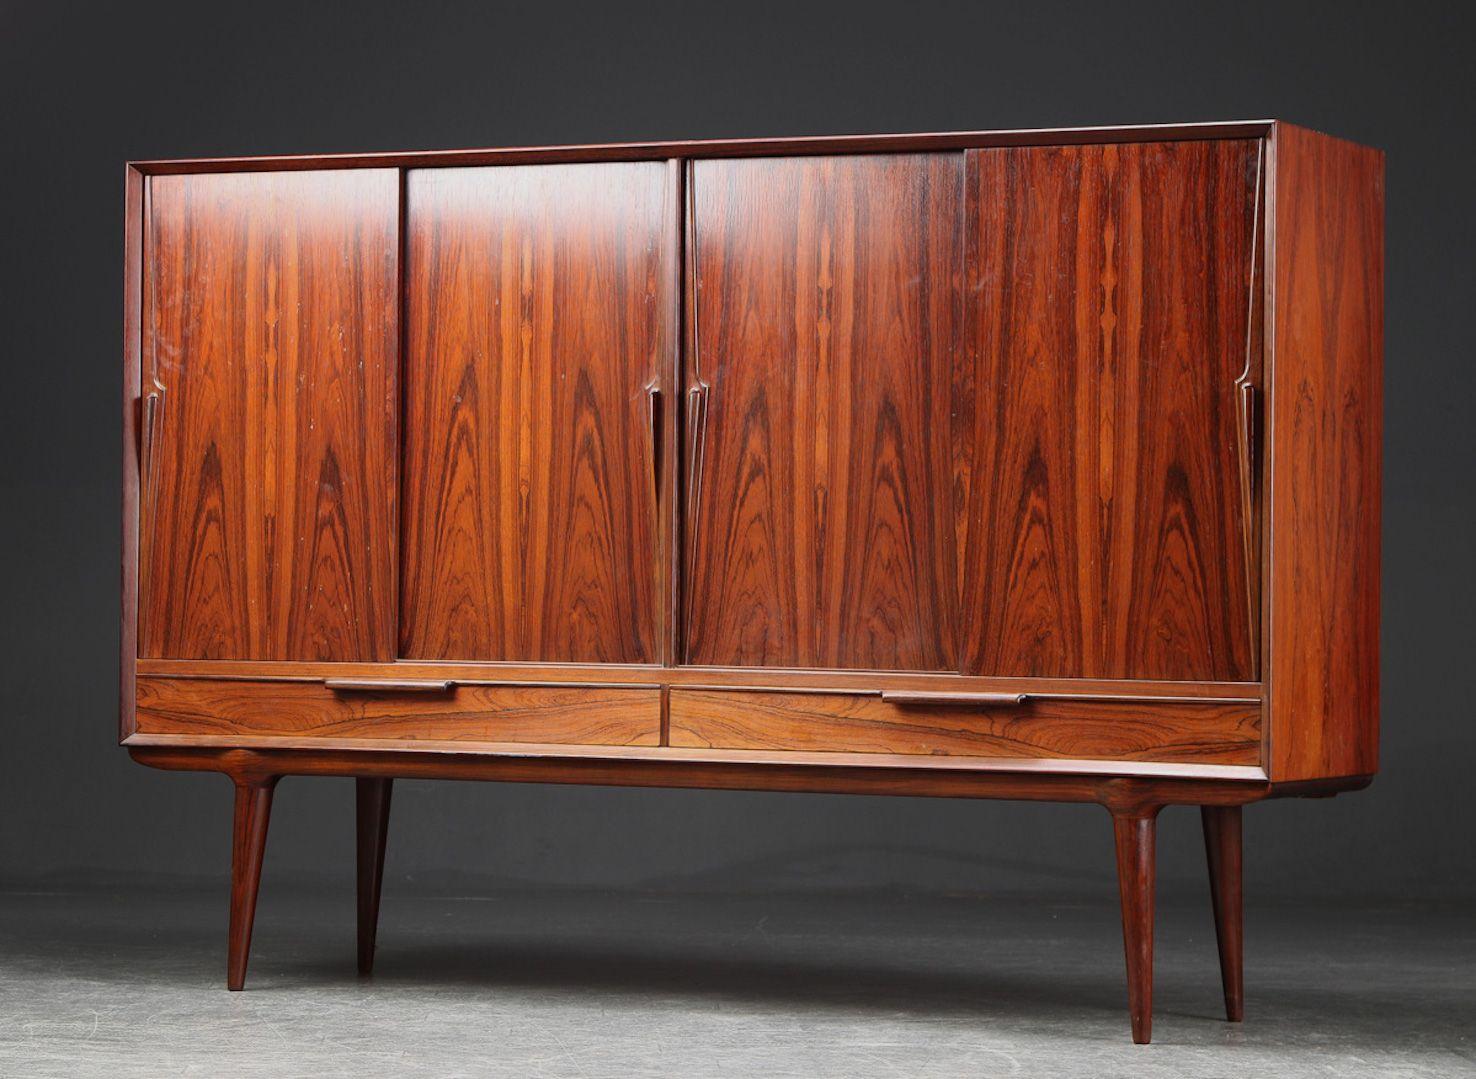 Danish Rosewood Credenza : Mid century danish rosewood credenza highboard by omann jun 1960s